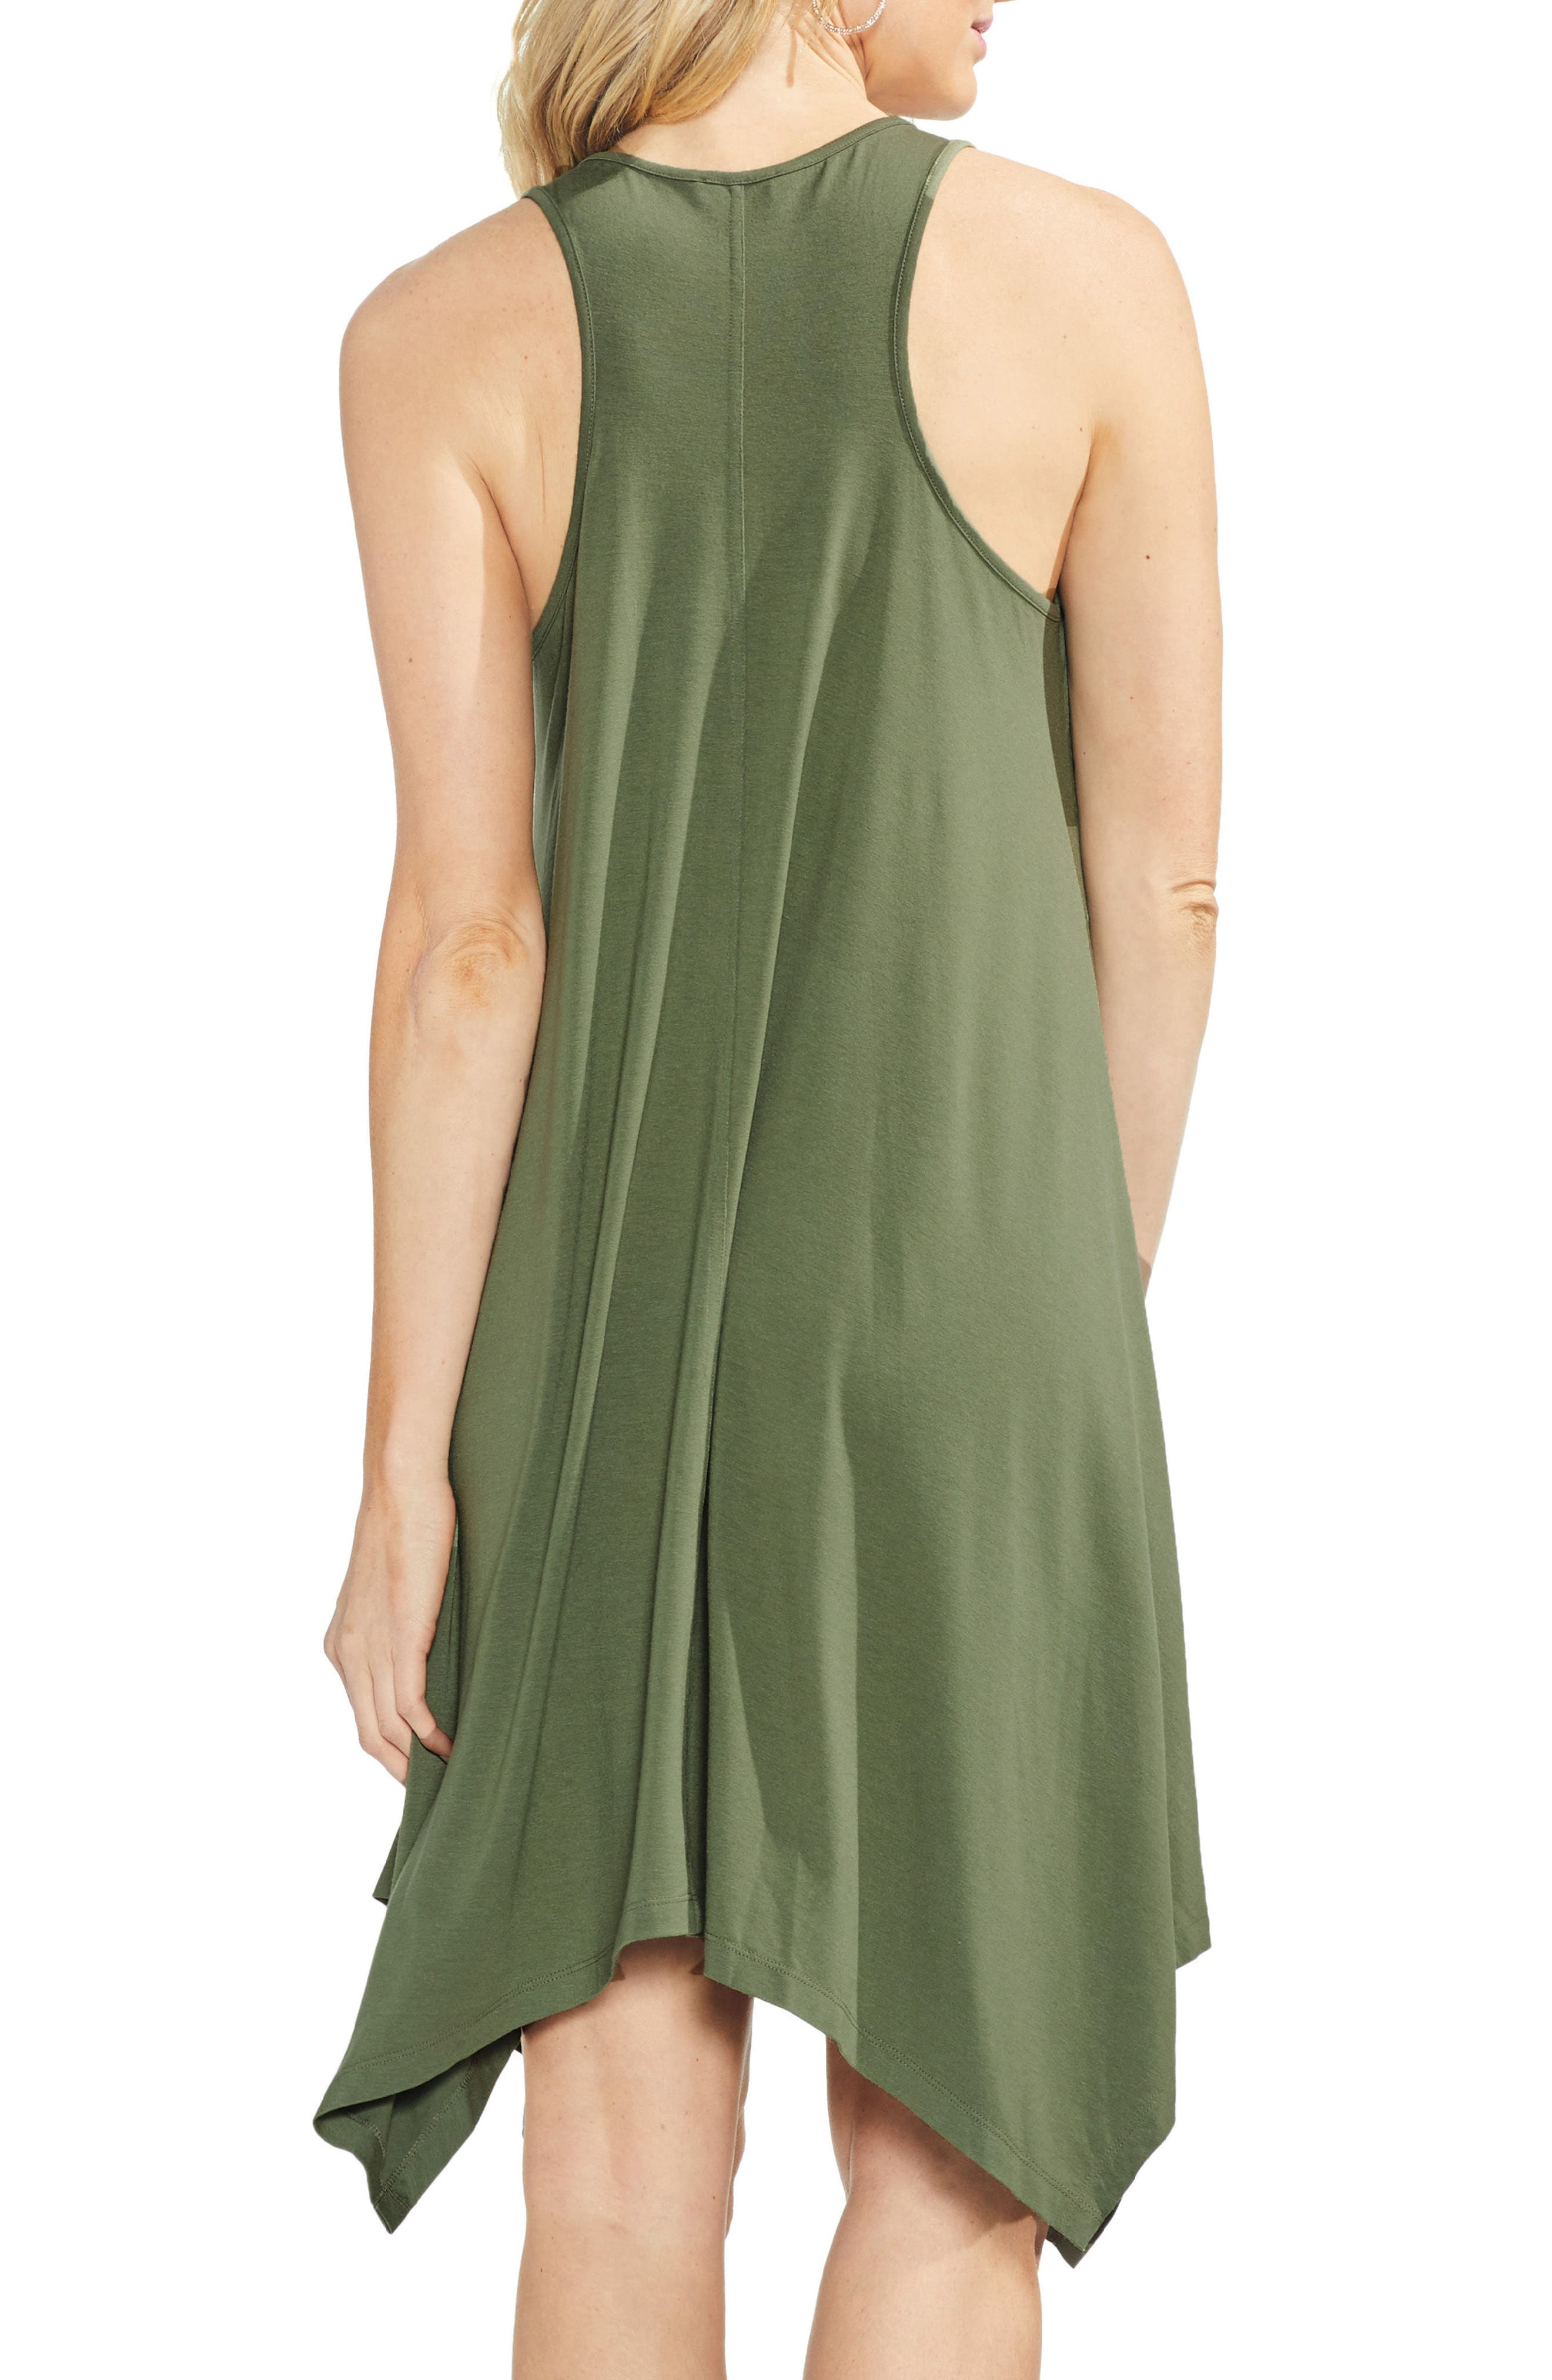 VINCE CAMUTO,                             Handkerchief Hem Tank Dress,                             Alternate thumbnail 2, color,                             300